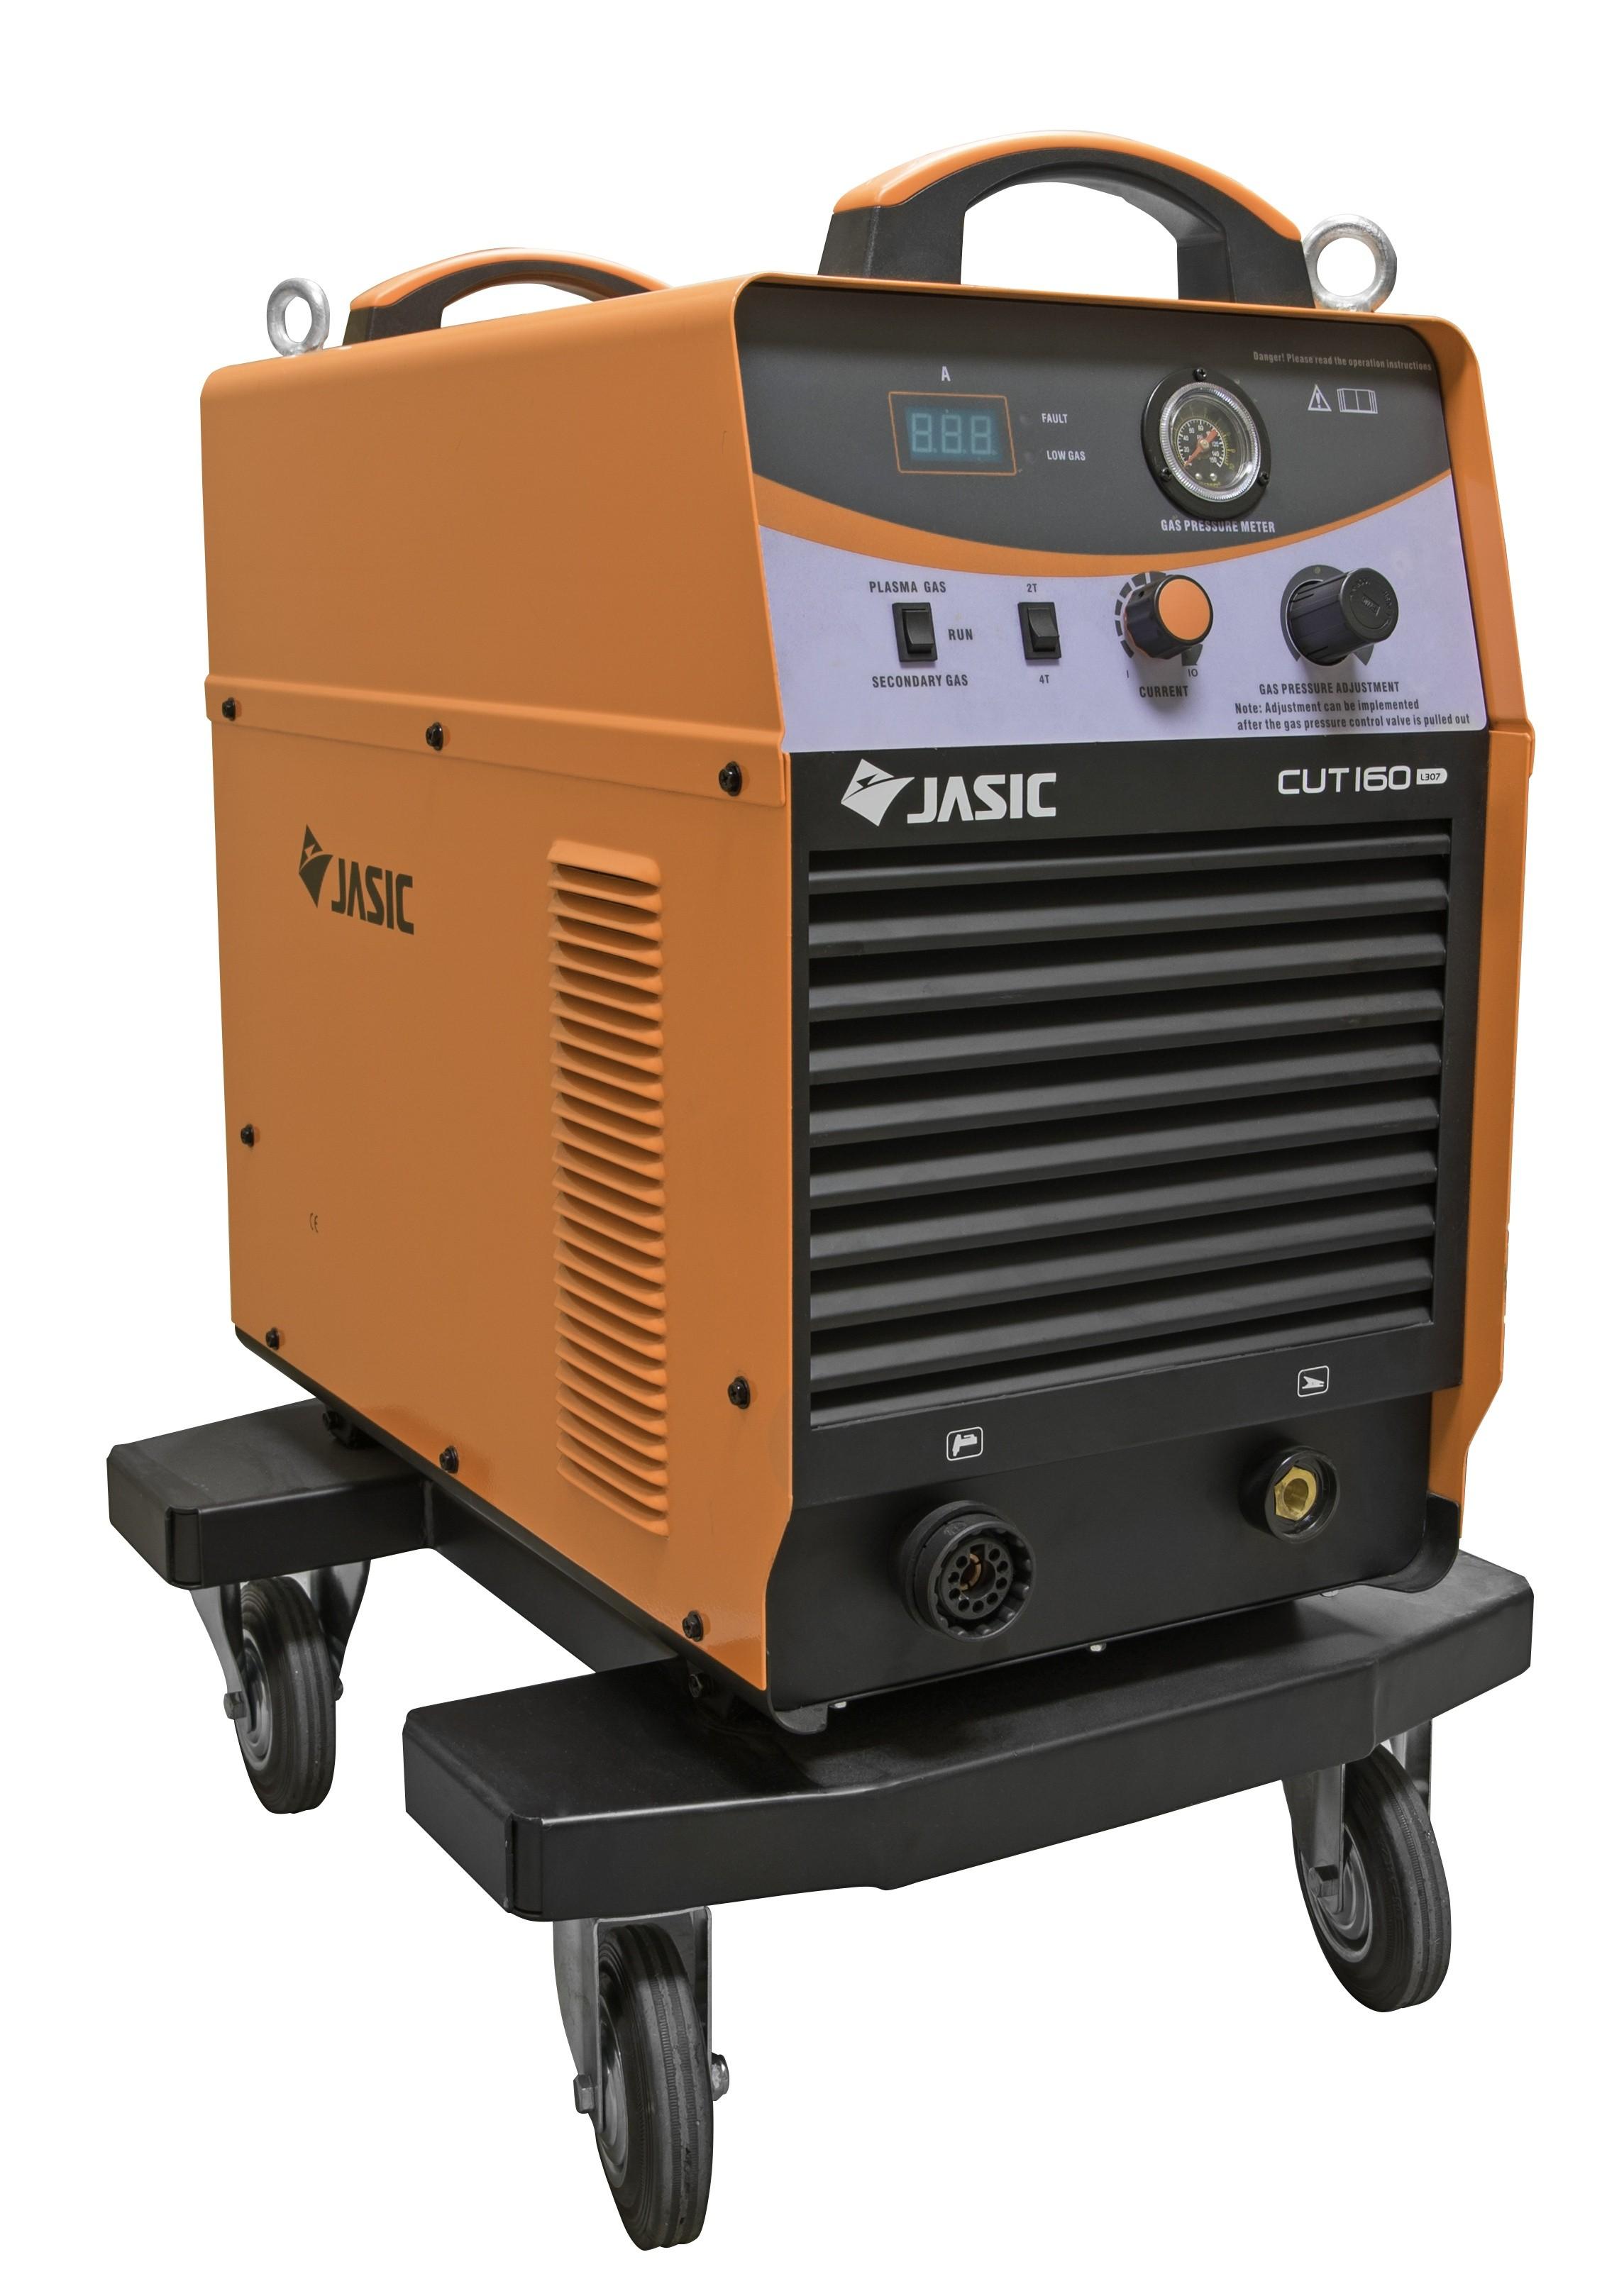 Jasic Plasma Cut 160 415V (with casters)